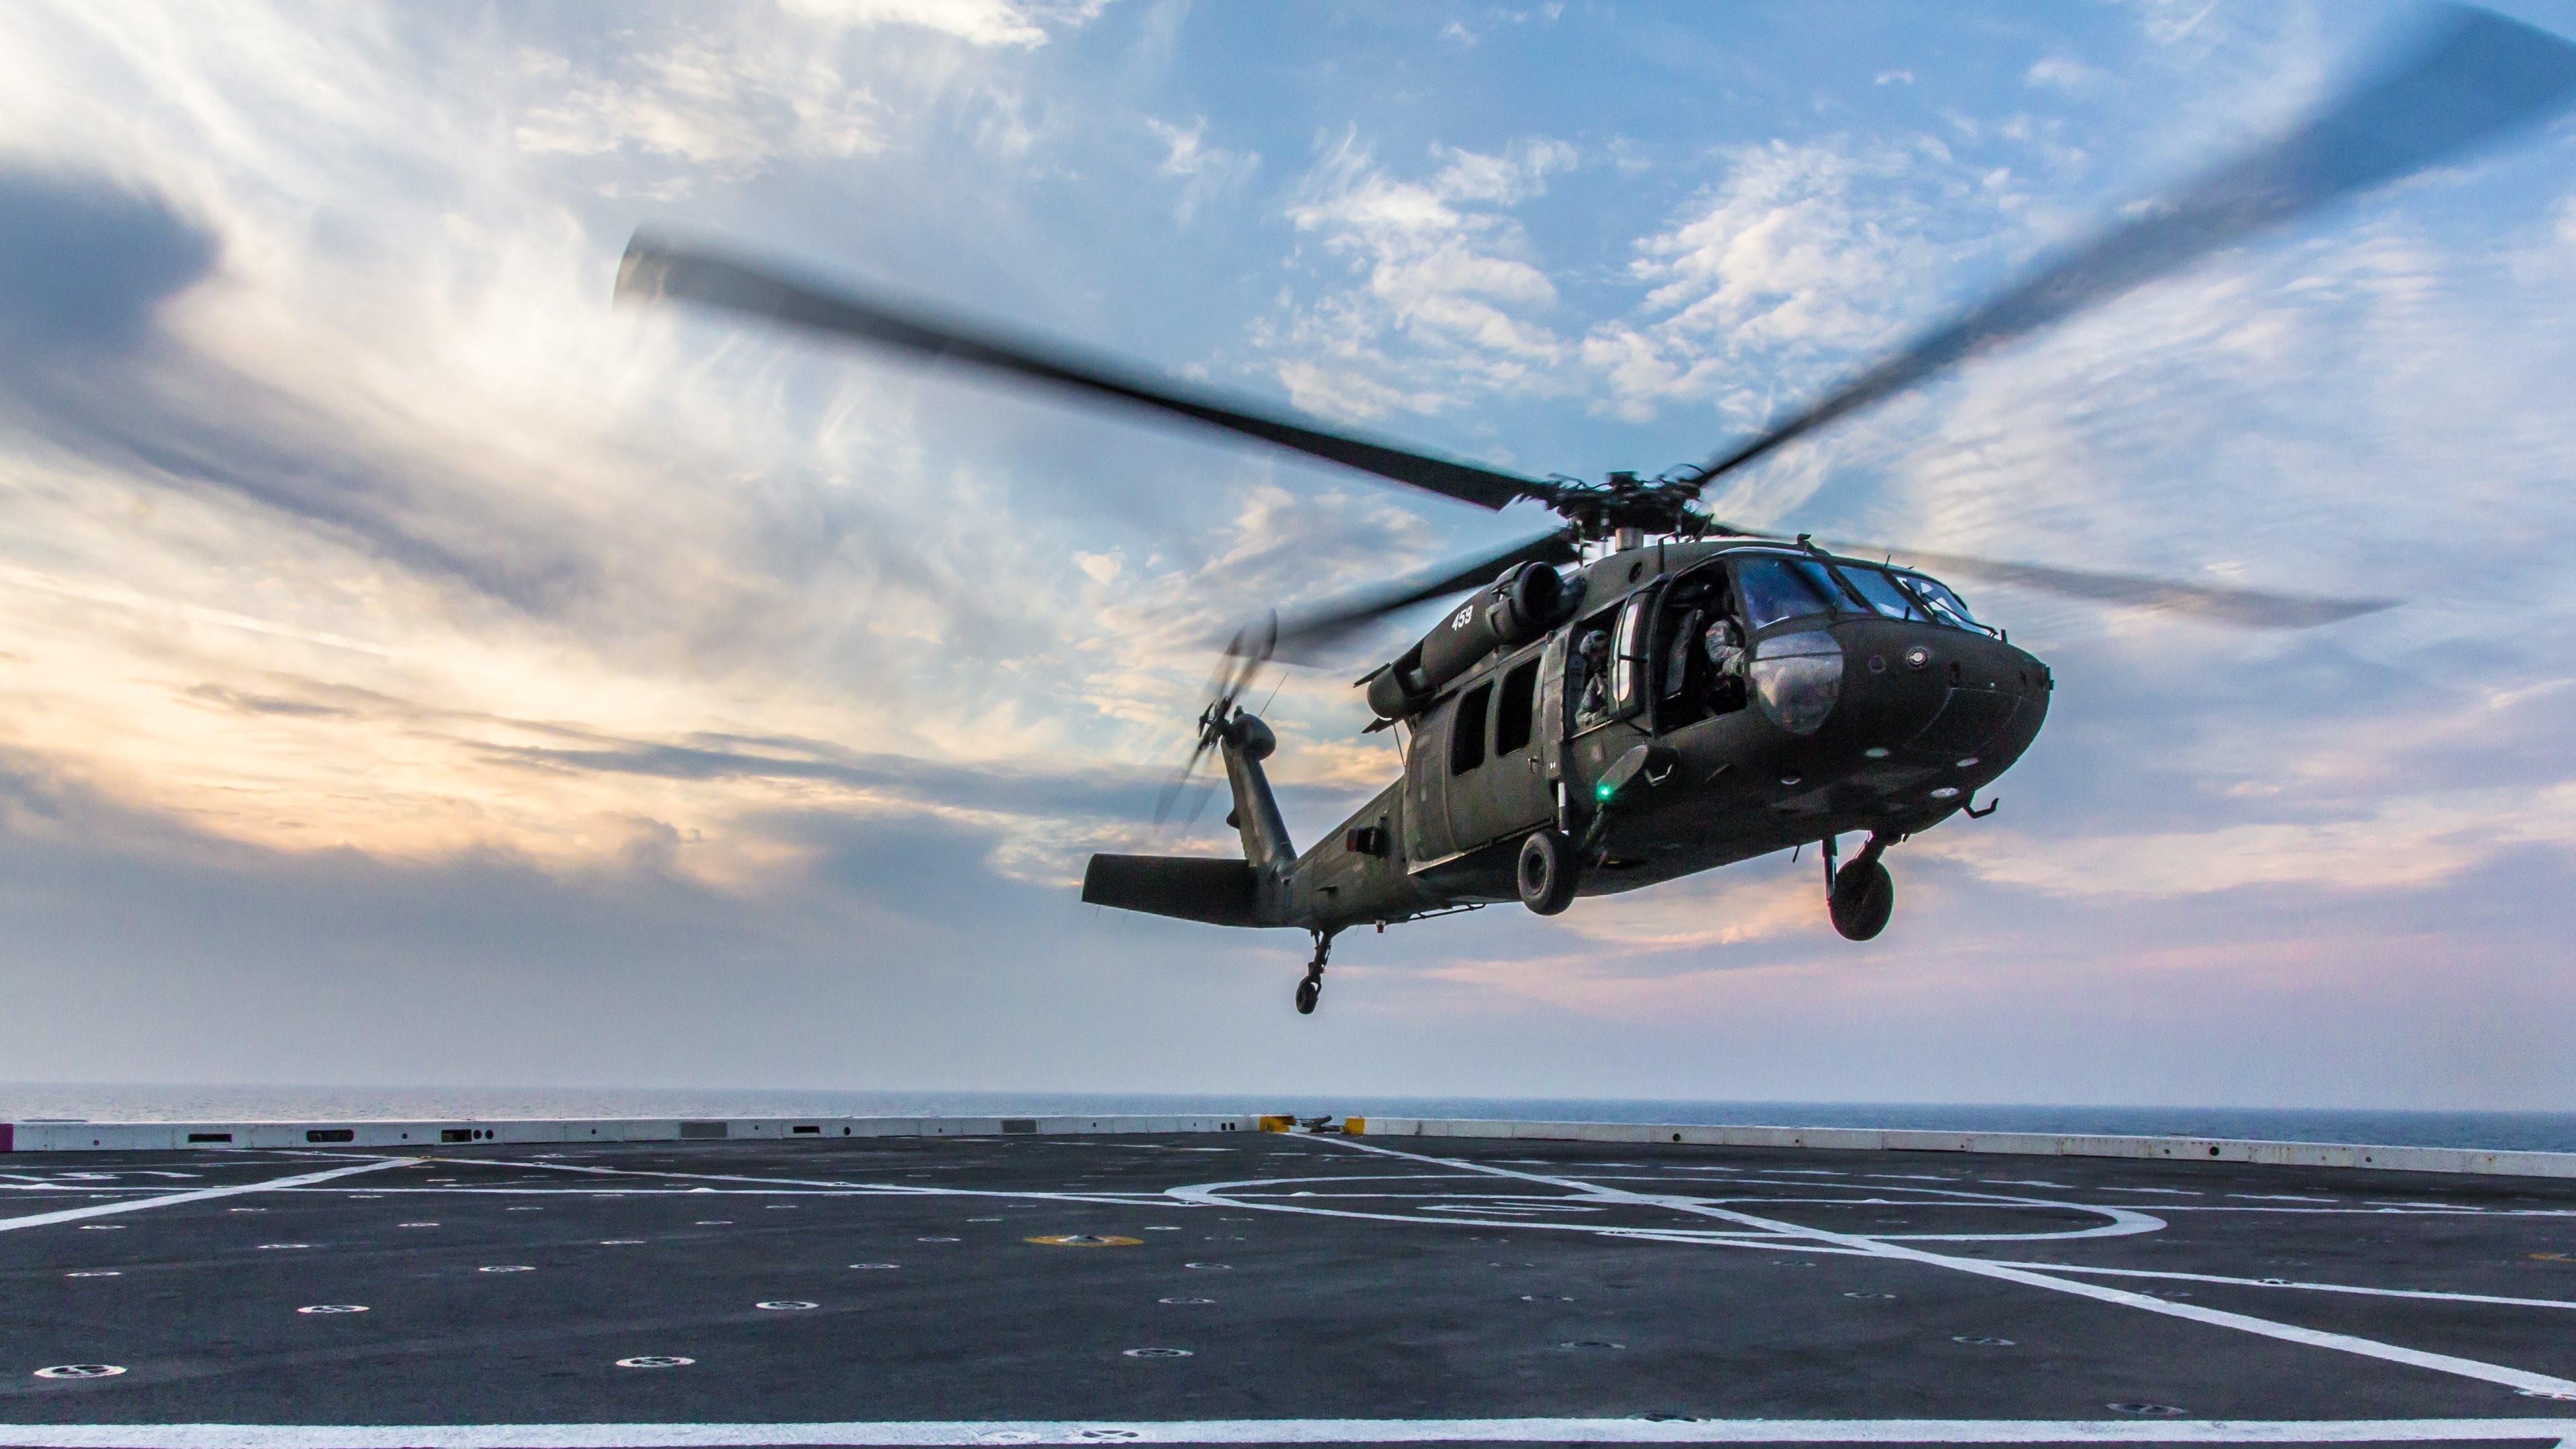 Military Helicopter 4k Hd Desktop Wallpaper For 4k Ultra